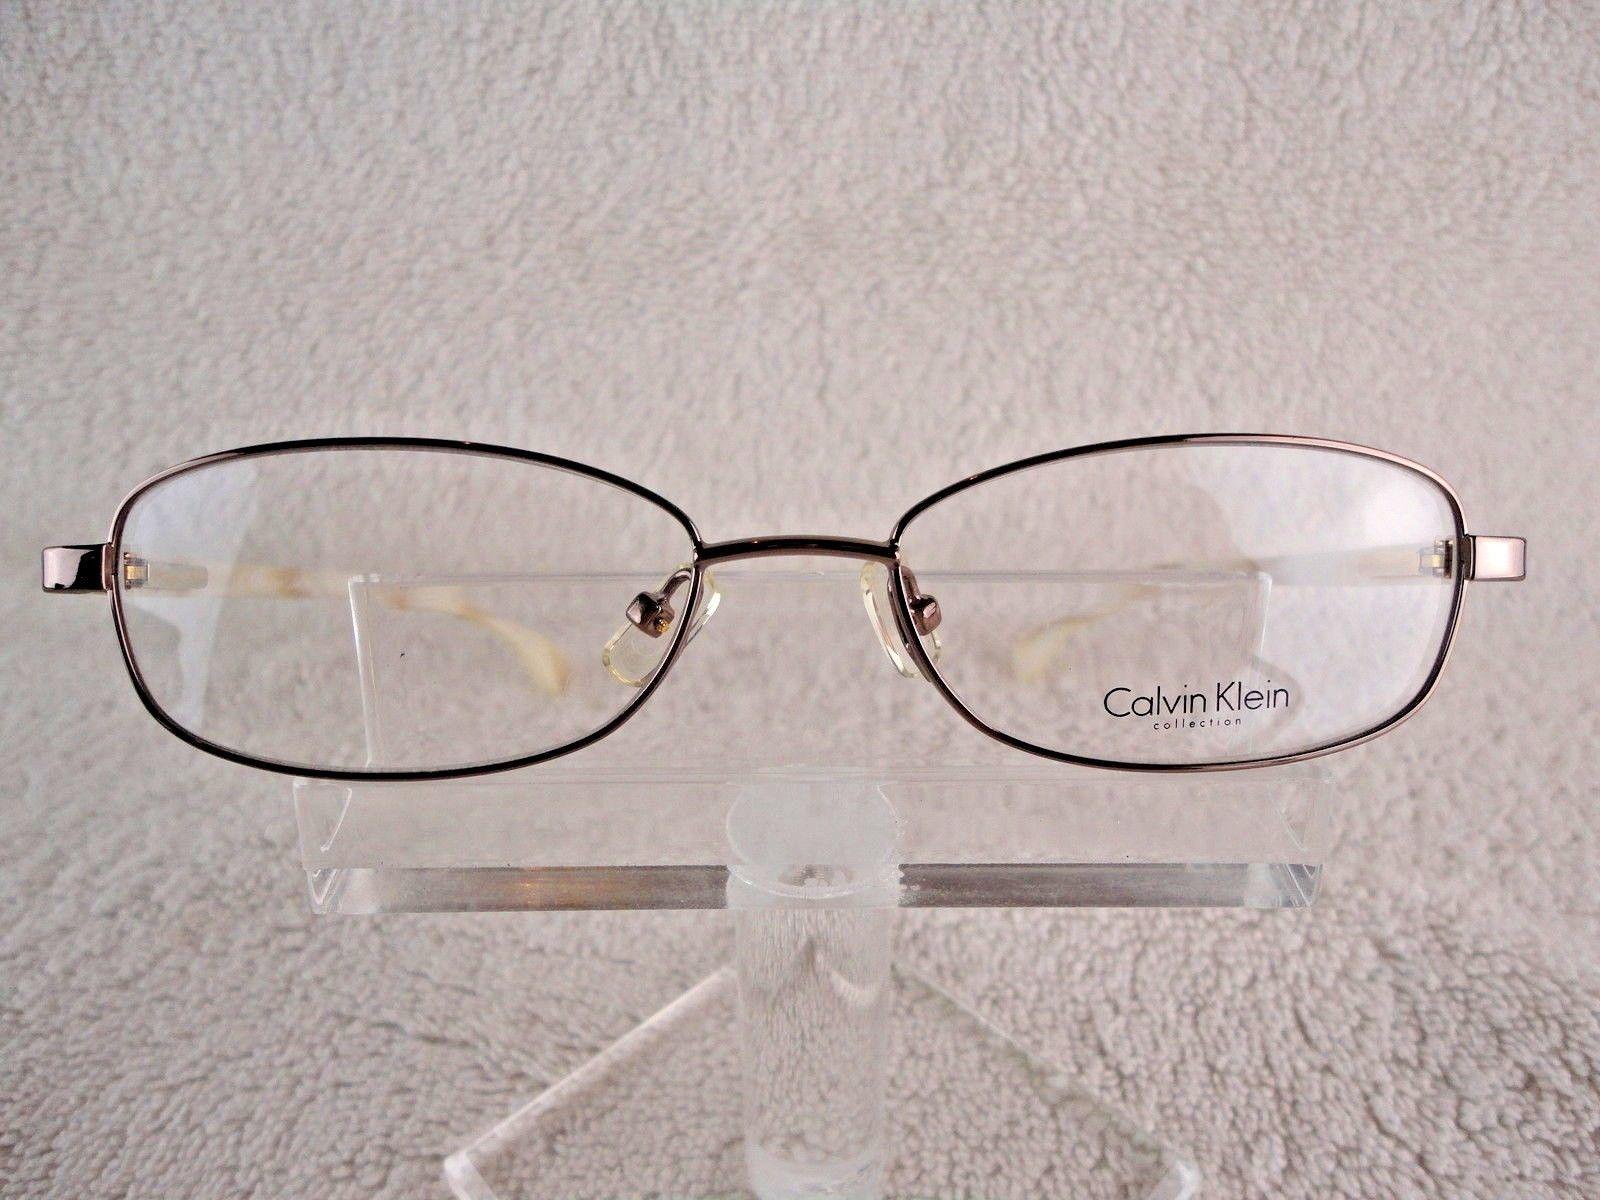 Calvin Klein CK 7241 (272)  Taupe 51 X 16 135 mm Eyeglass Frame